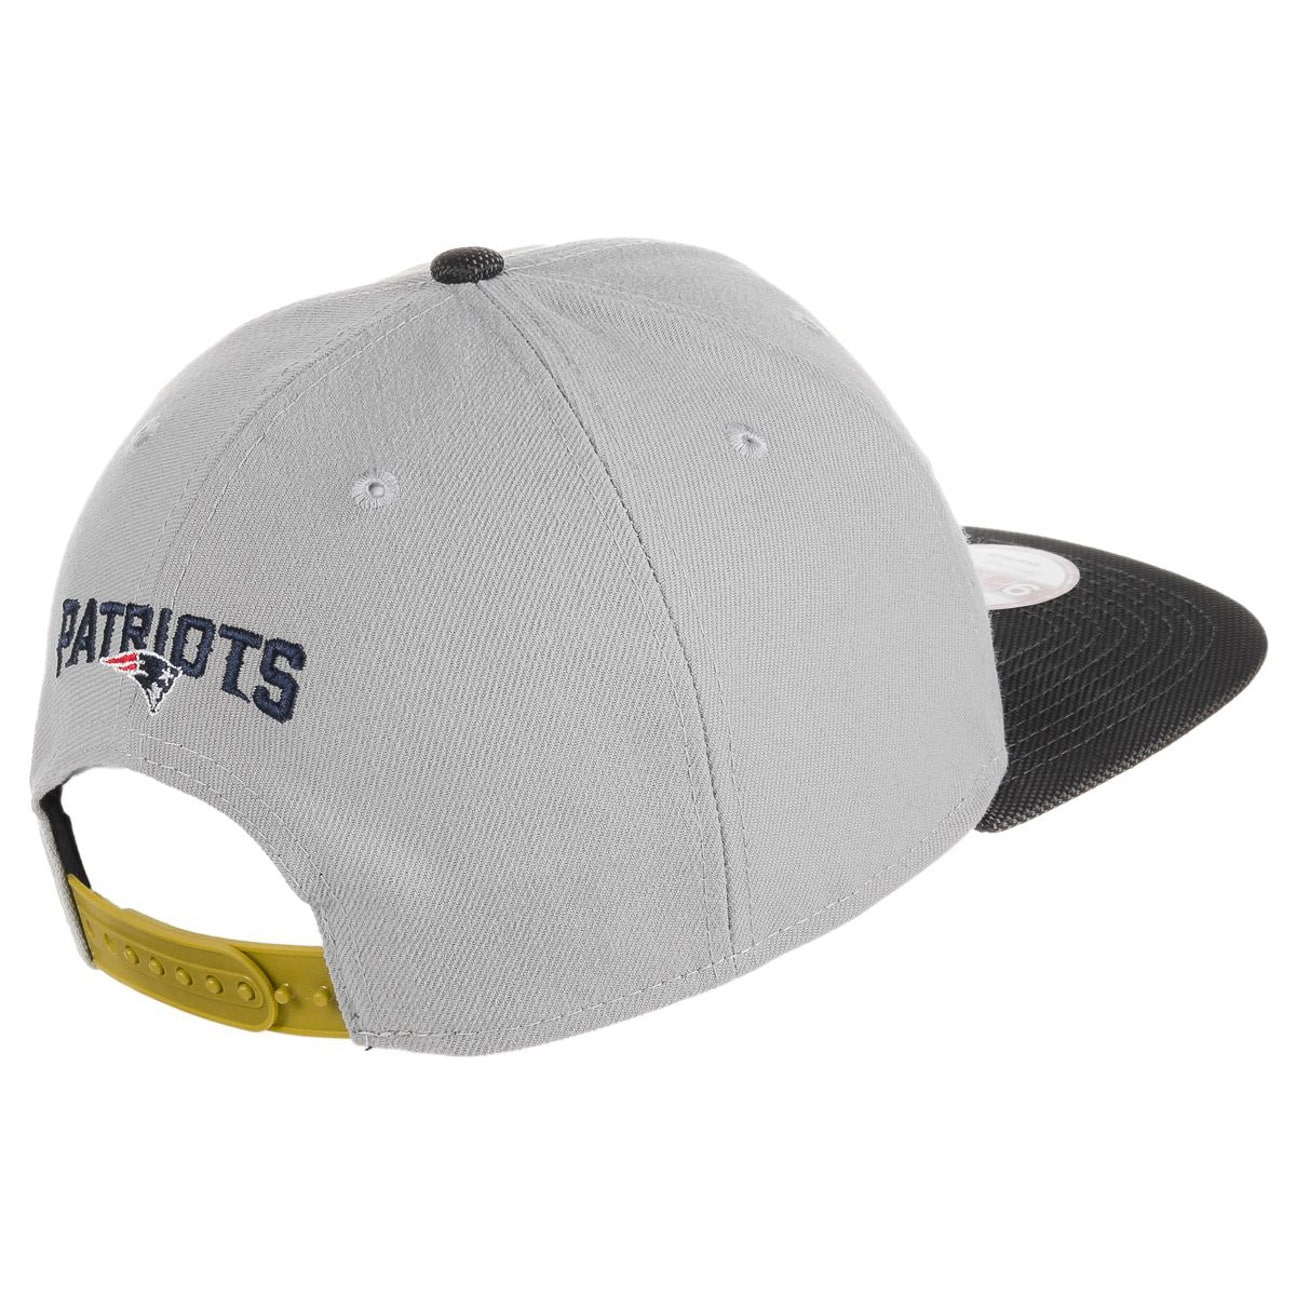 New England Patriots Gold Cap By New Era 39 95